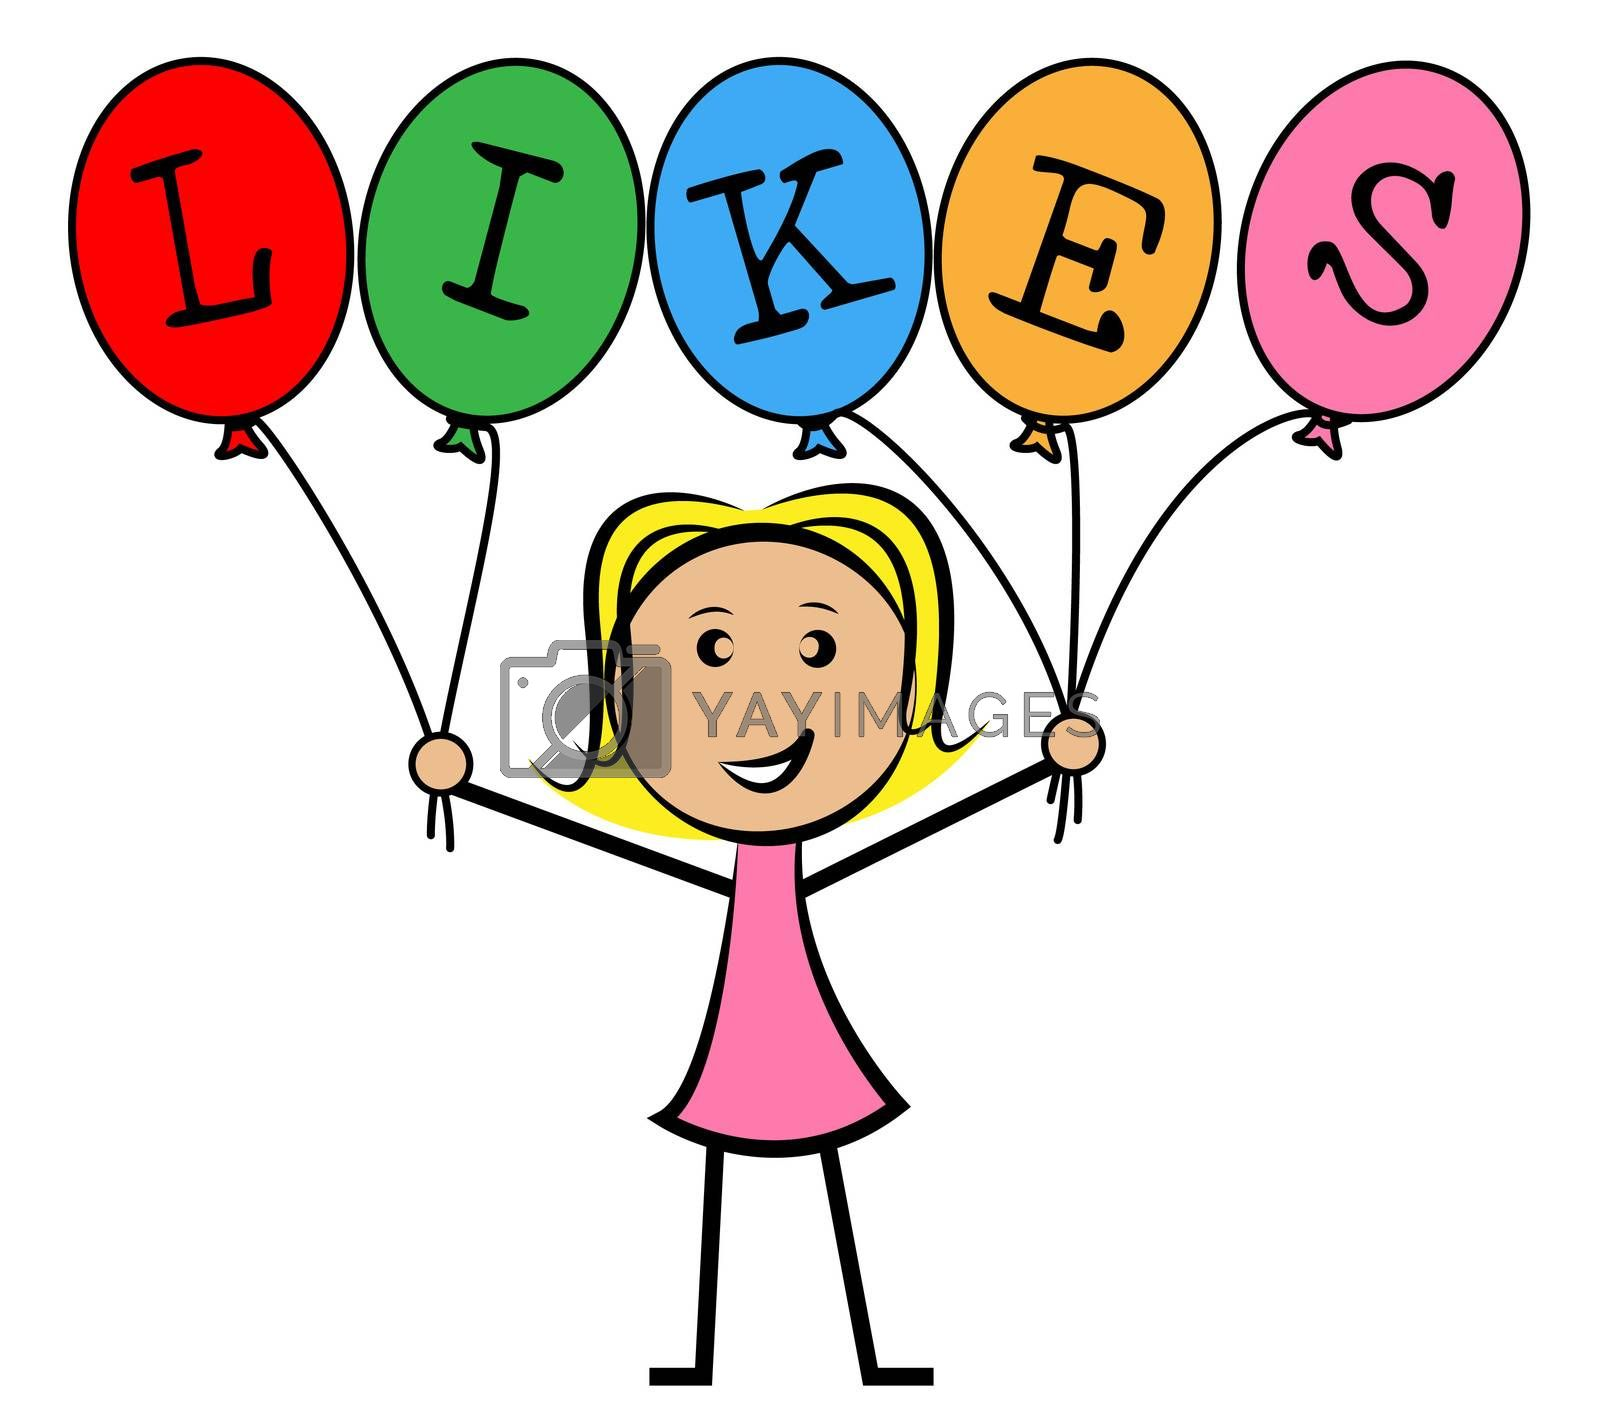 Likes Balloons Indicates Social Media And Kids by stuartmiles